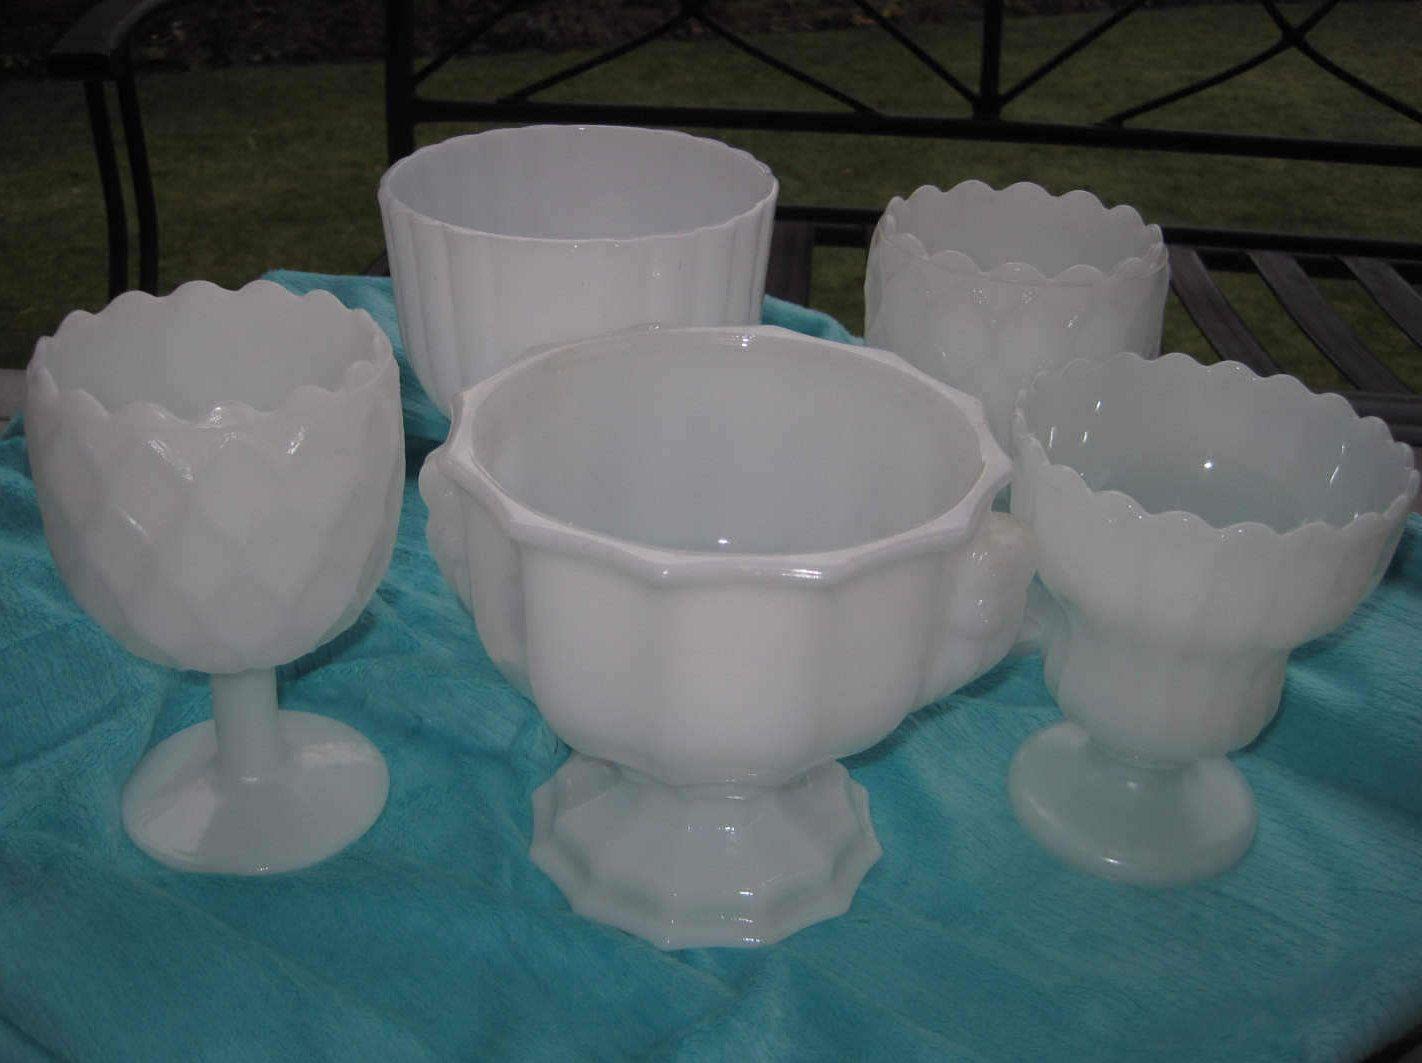 5 White Milk Glass Wedding Centerpiece Vases, Set Of 5 By